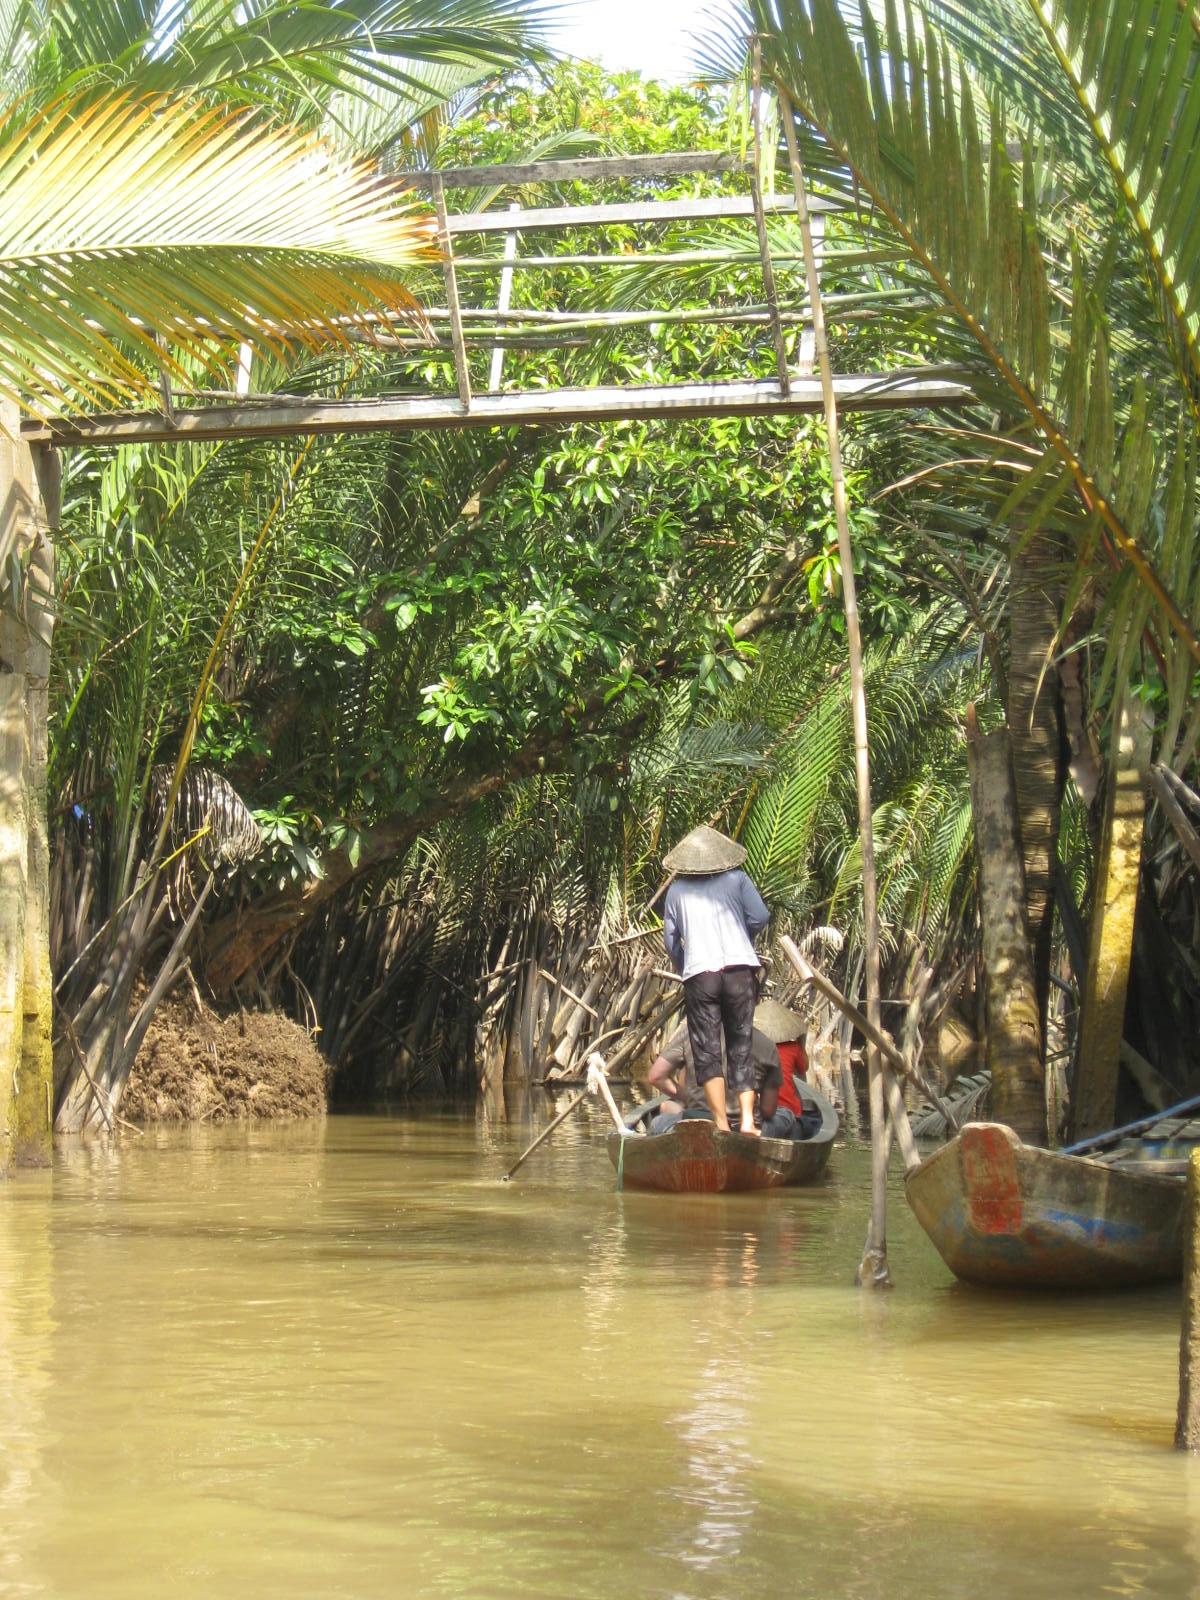 Gondola Ride Through Jungle In Mekong Delta